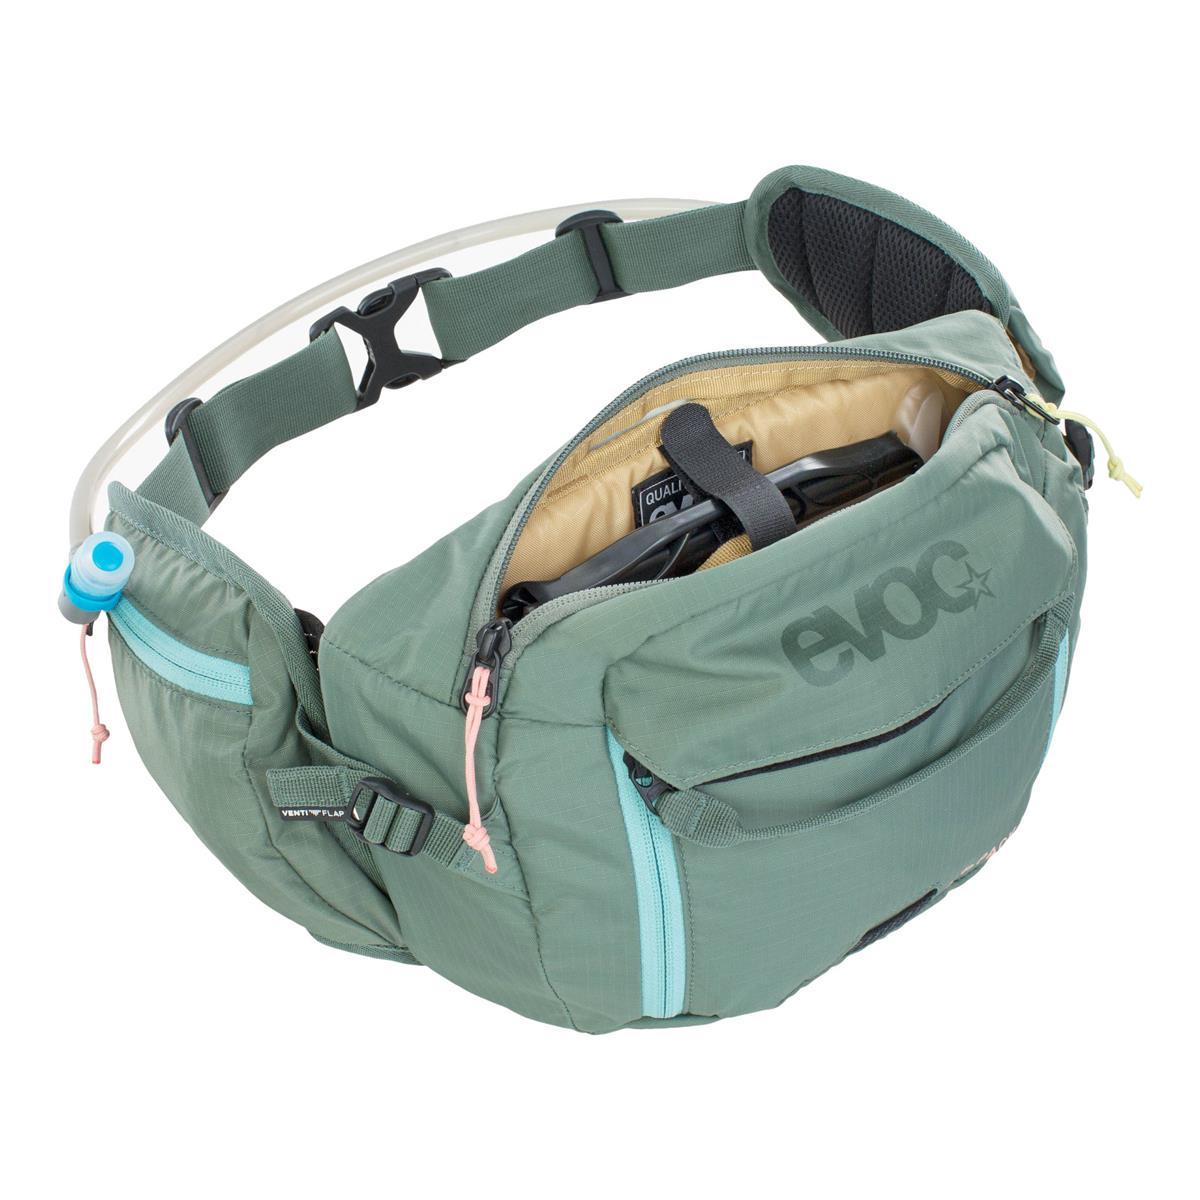 Wais Bag Hip Pack 3L + 1,5L Hydration Bladder Green